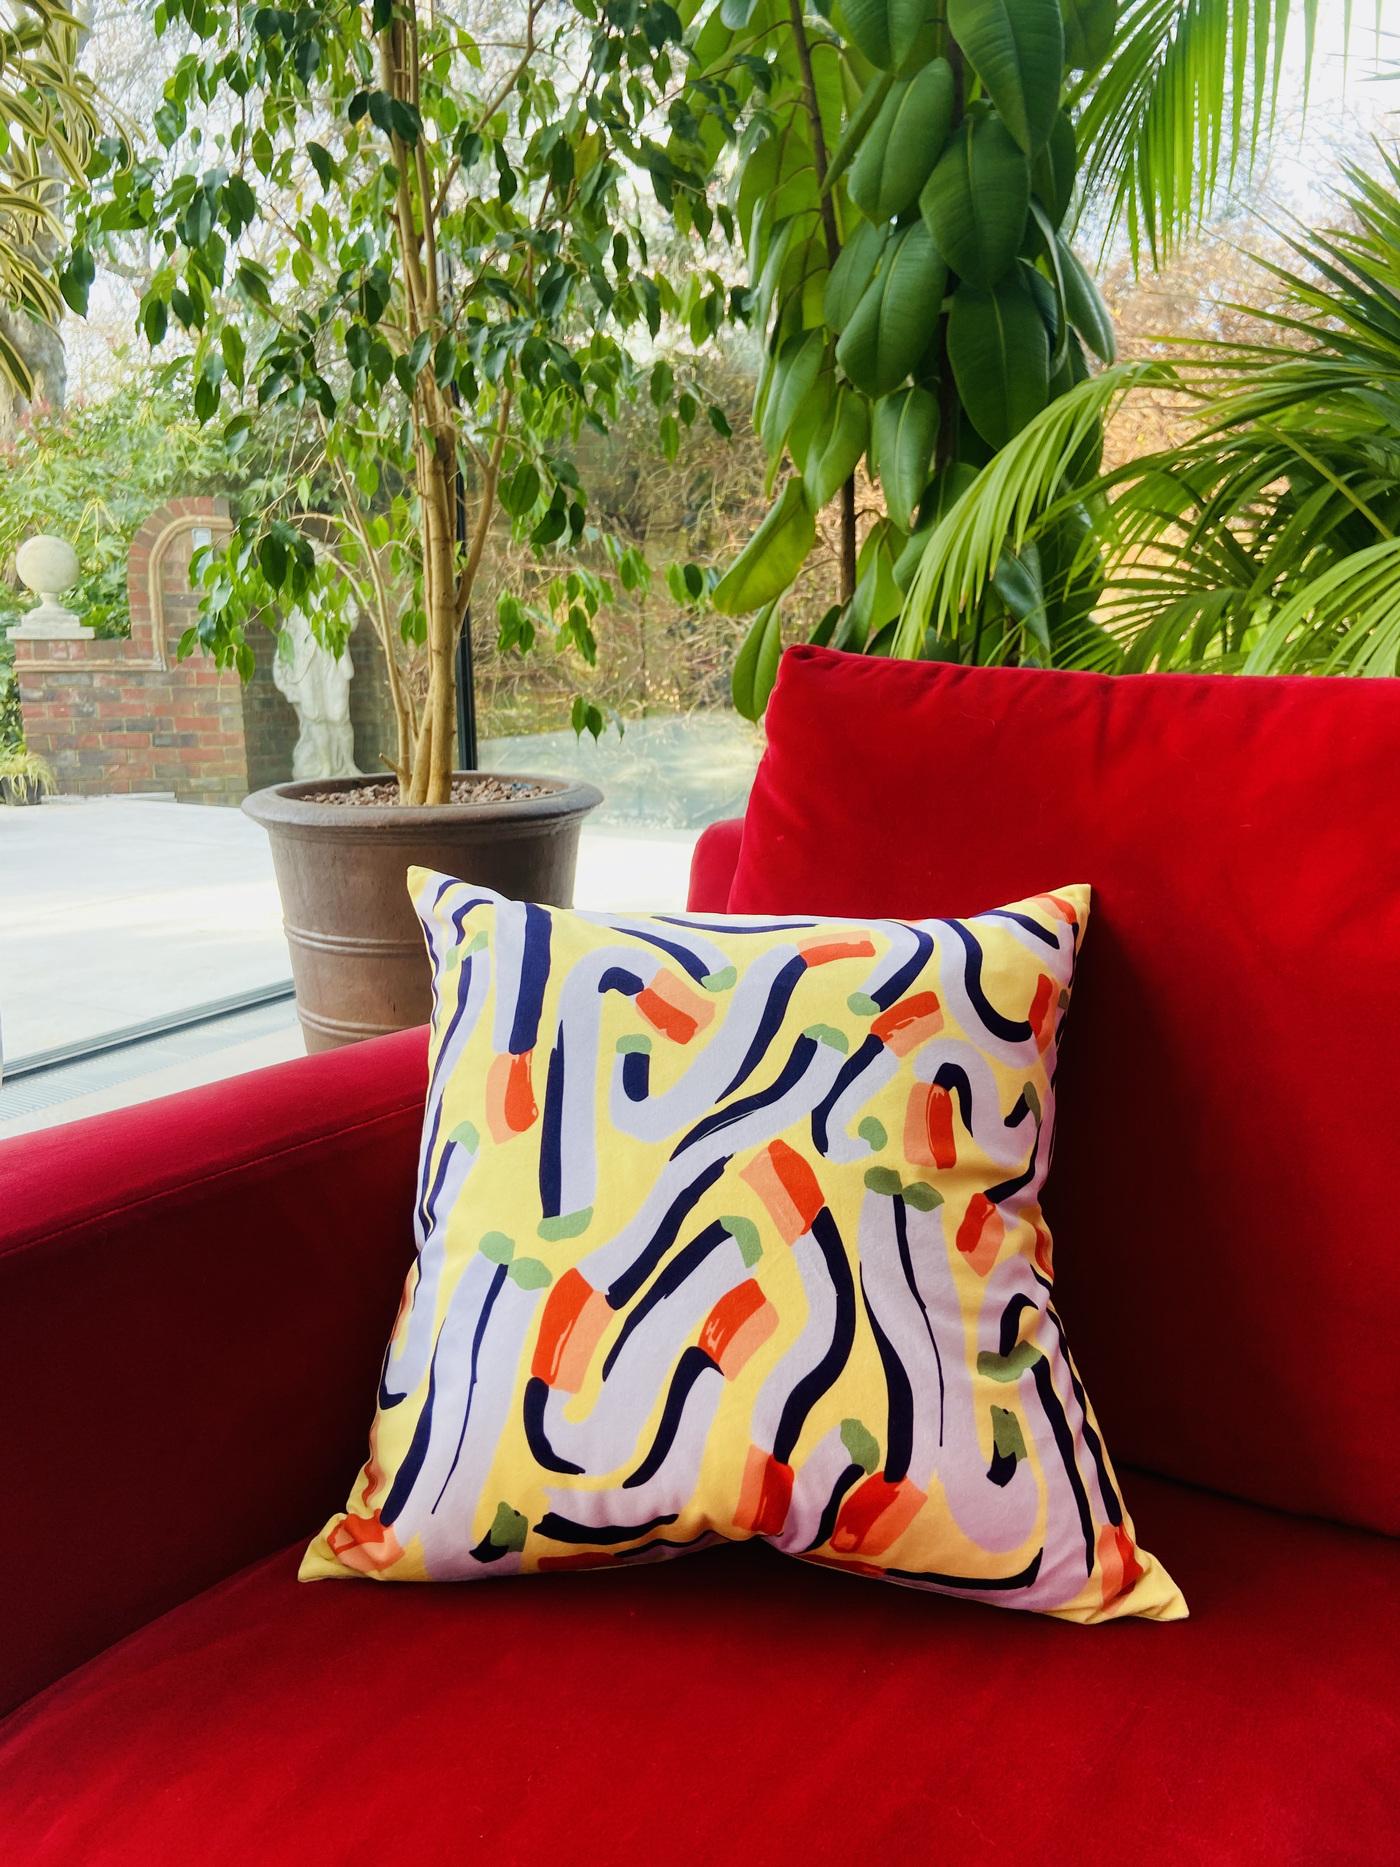 Anna Choutova - Yellow Cigarette Cushion Cover Velvet Cover Only45 cm x 45 cm